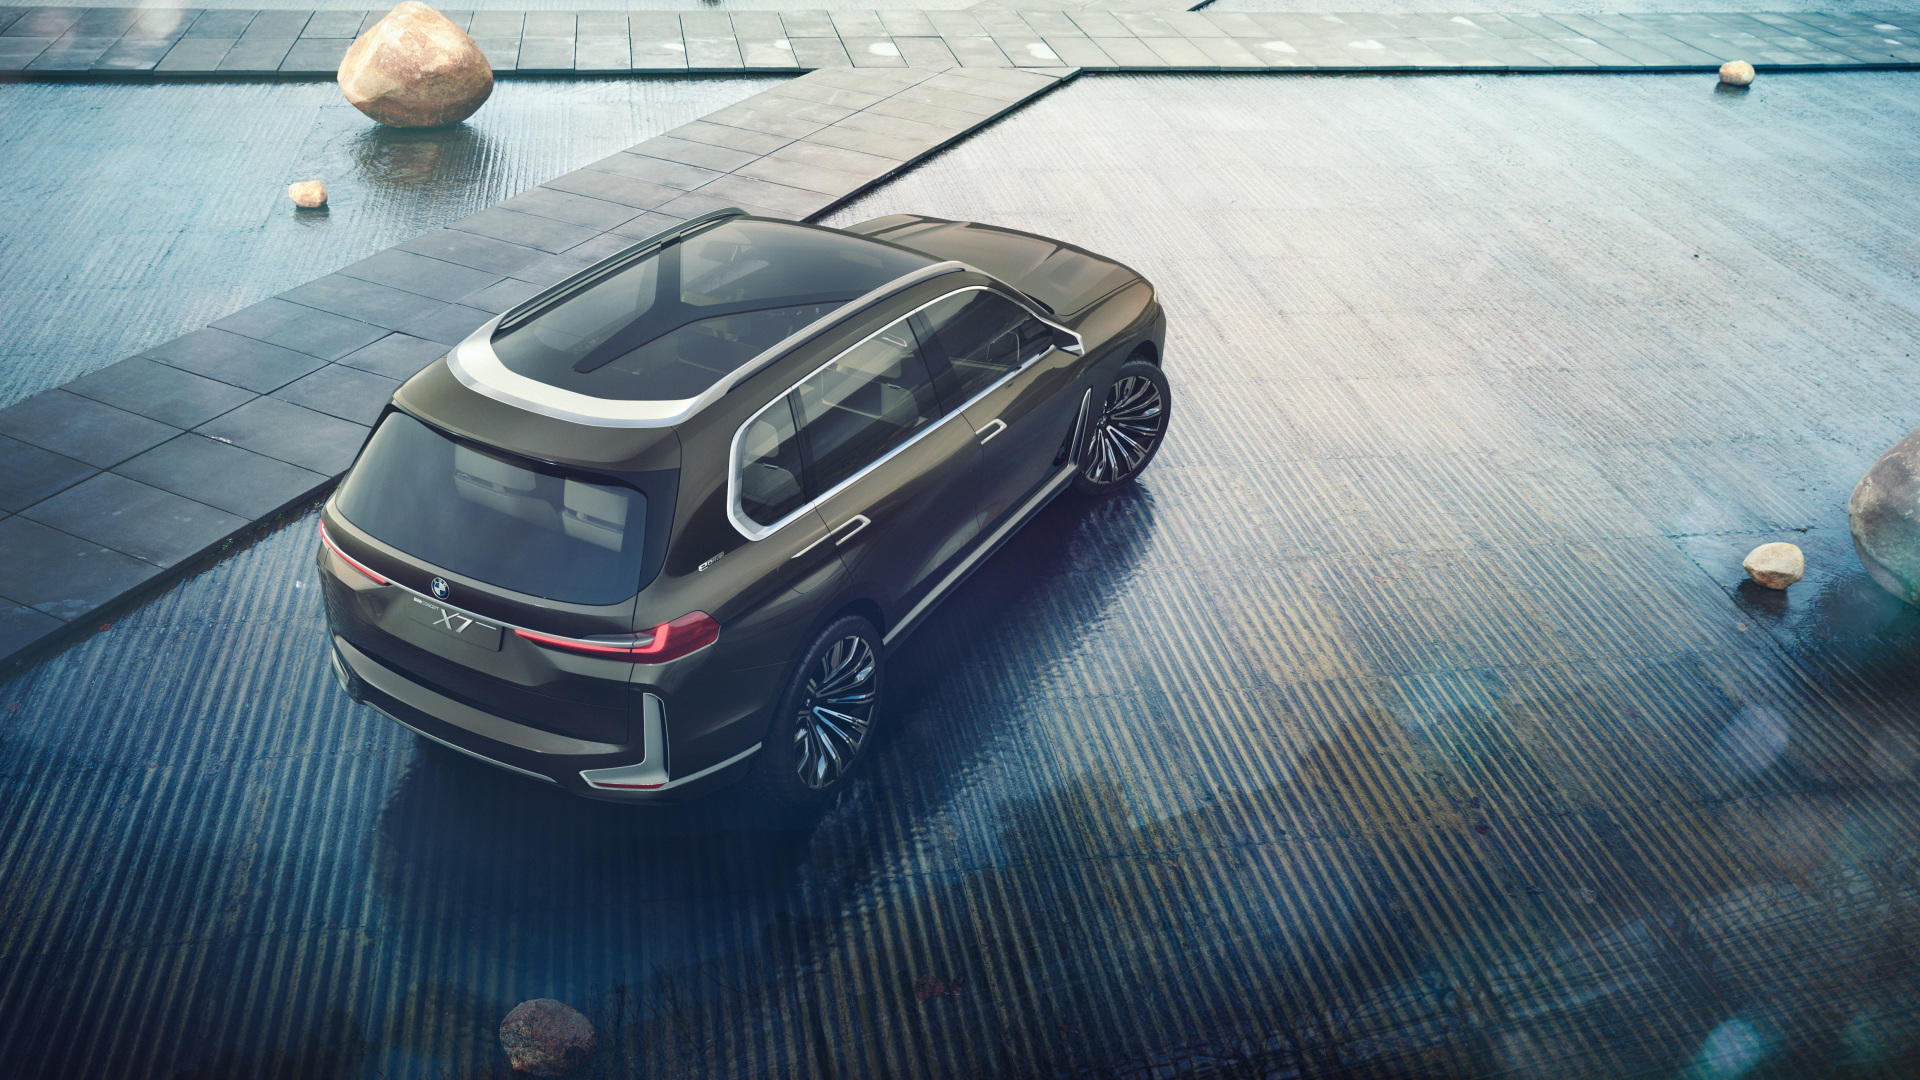 BMW-x7-concept-dm-17.jpg